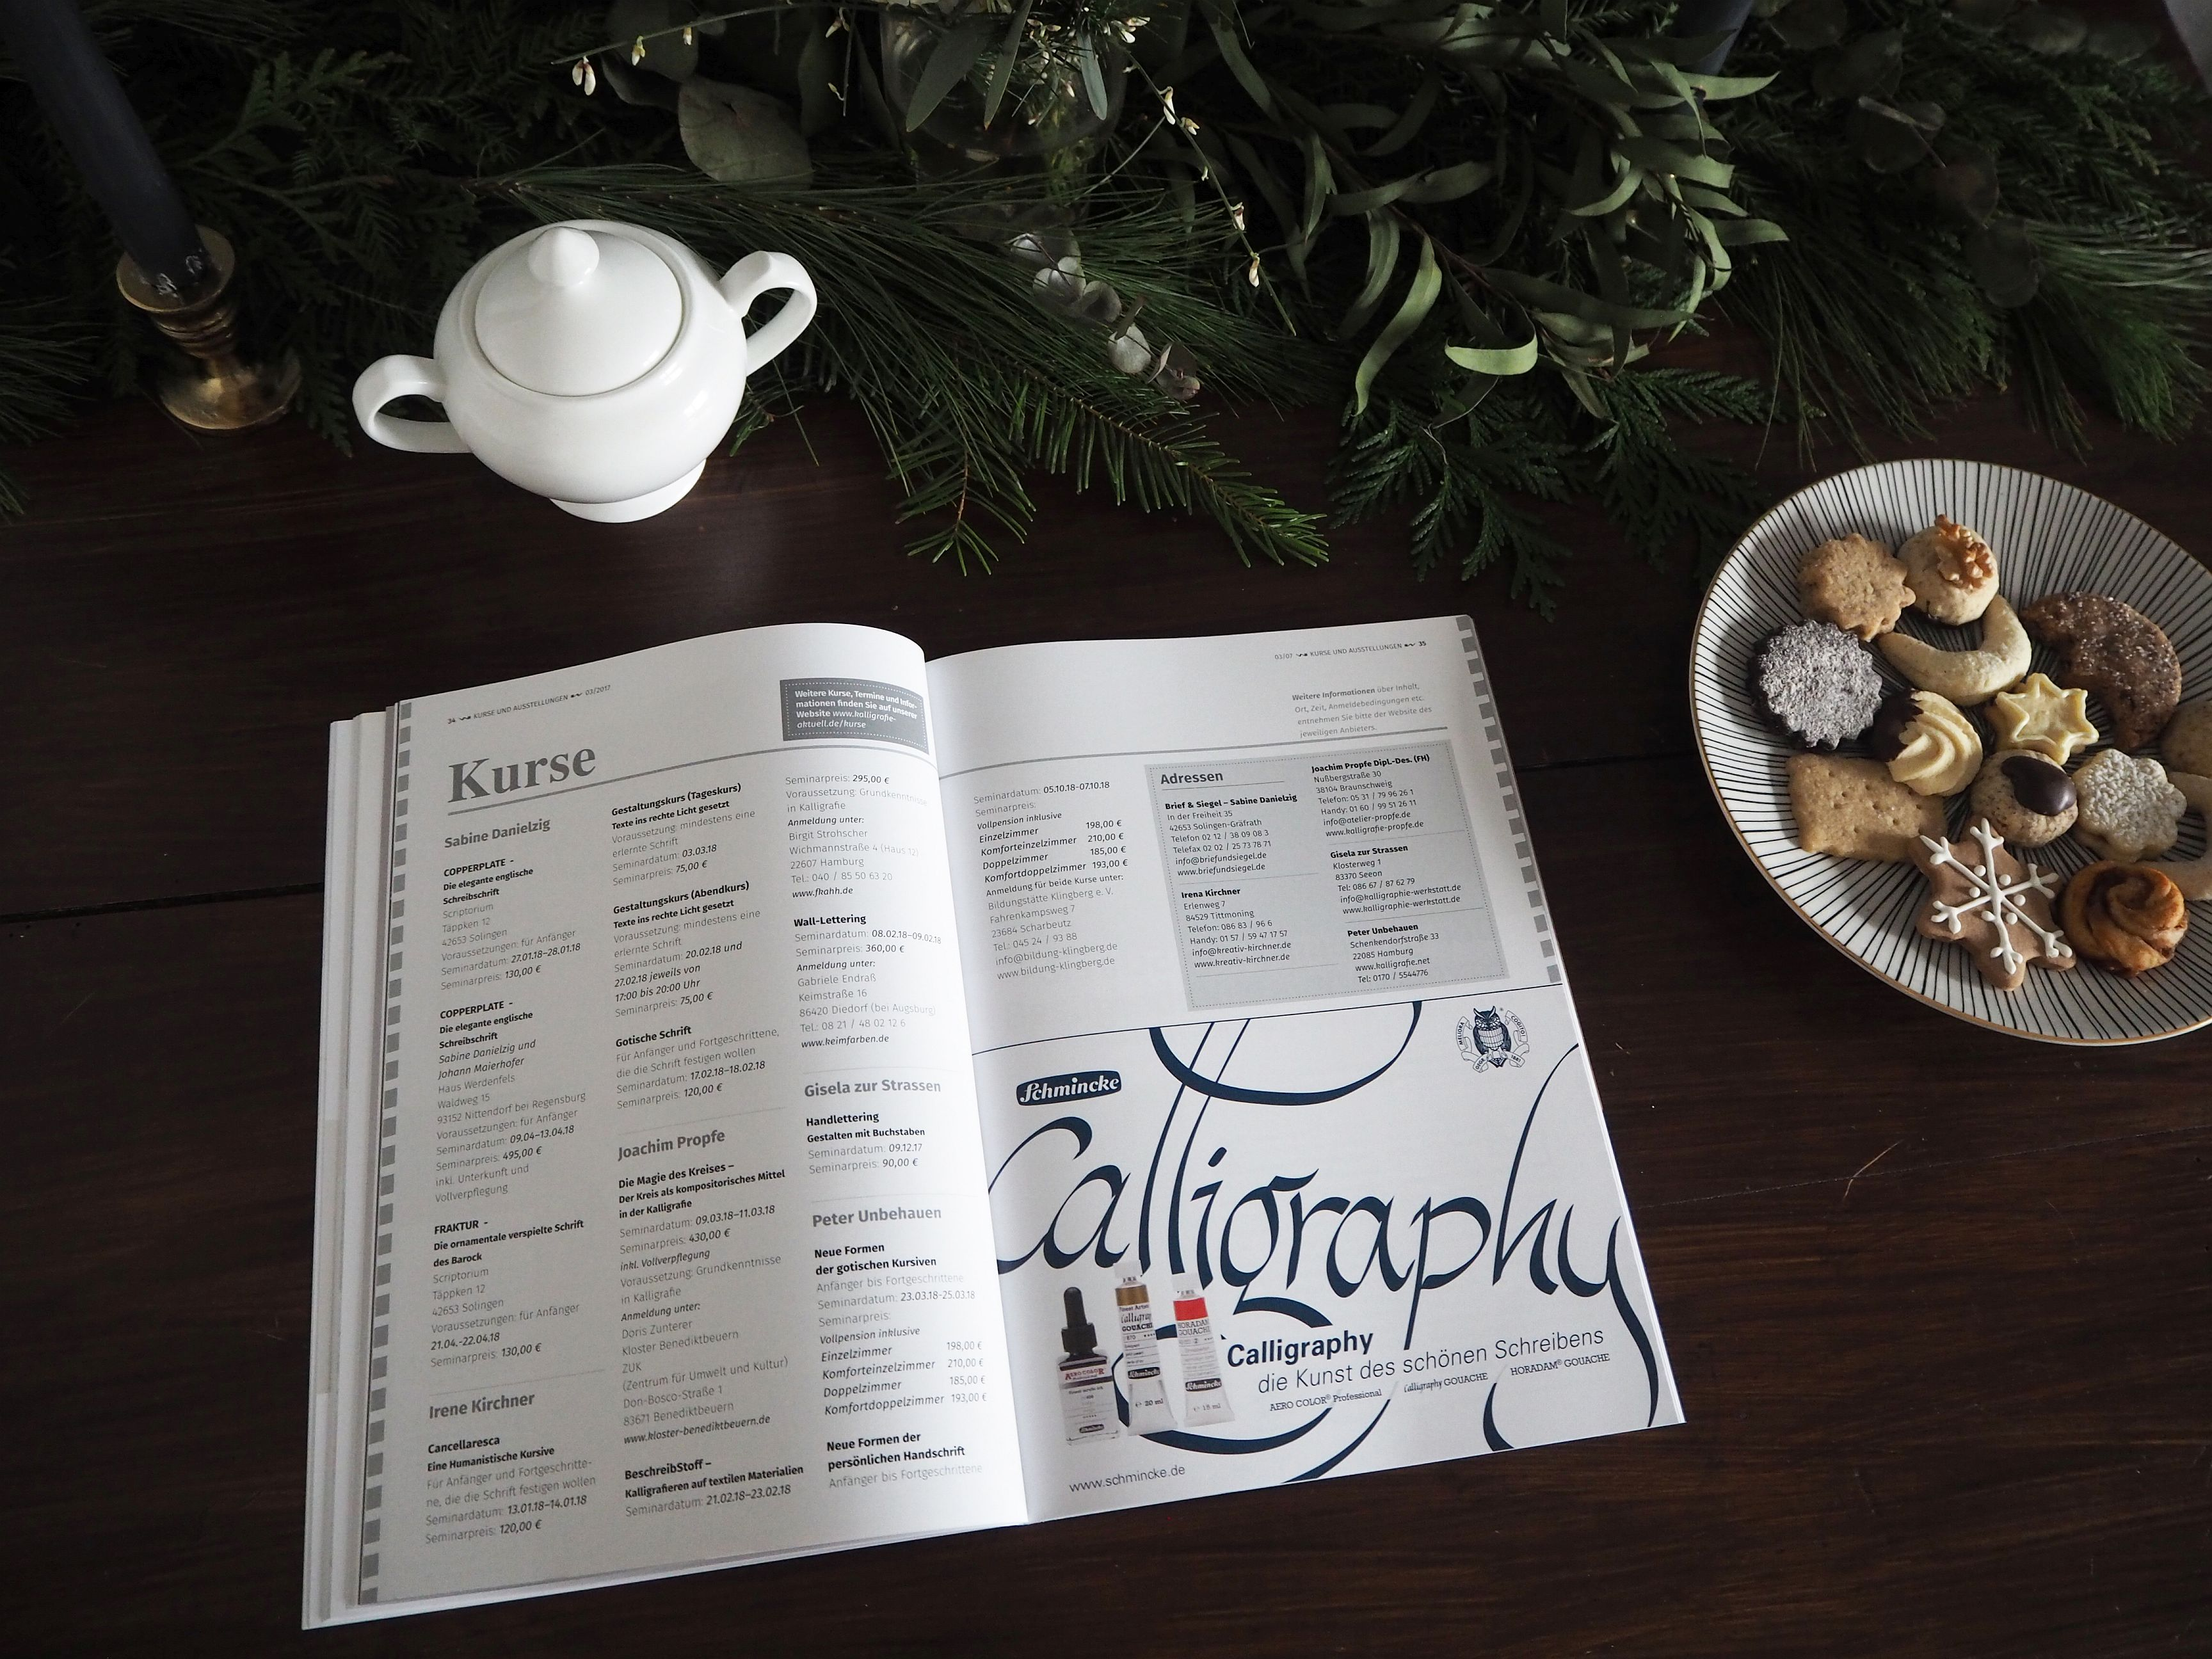 2017-12-skoen-och-kreativ-sonntagslektuere-zeitschrift-kalligrafie-aktuell (10)